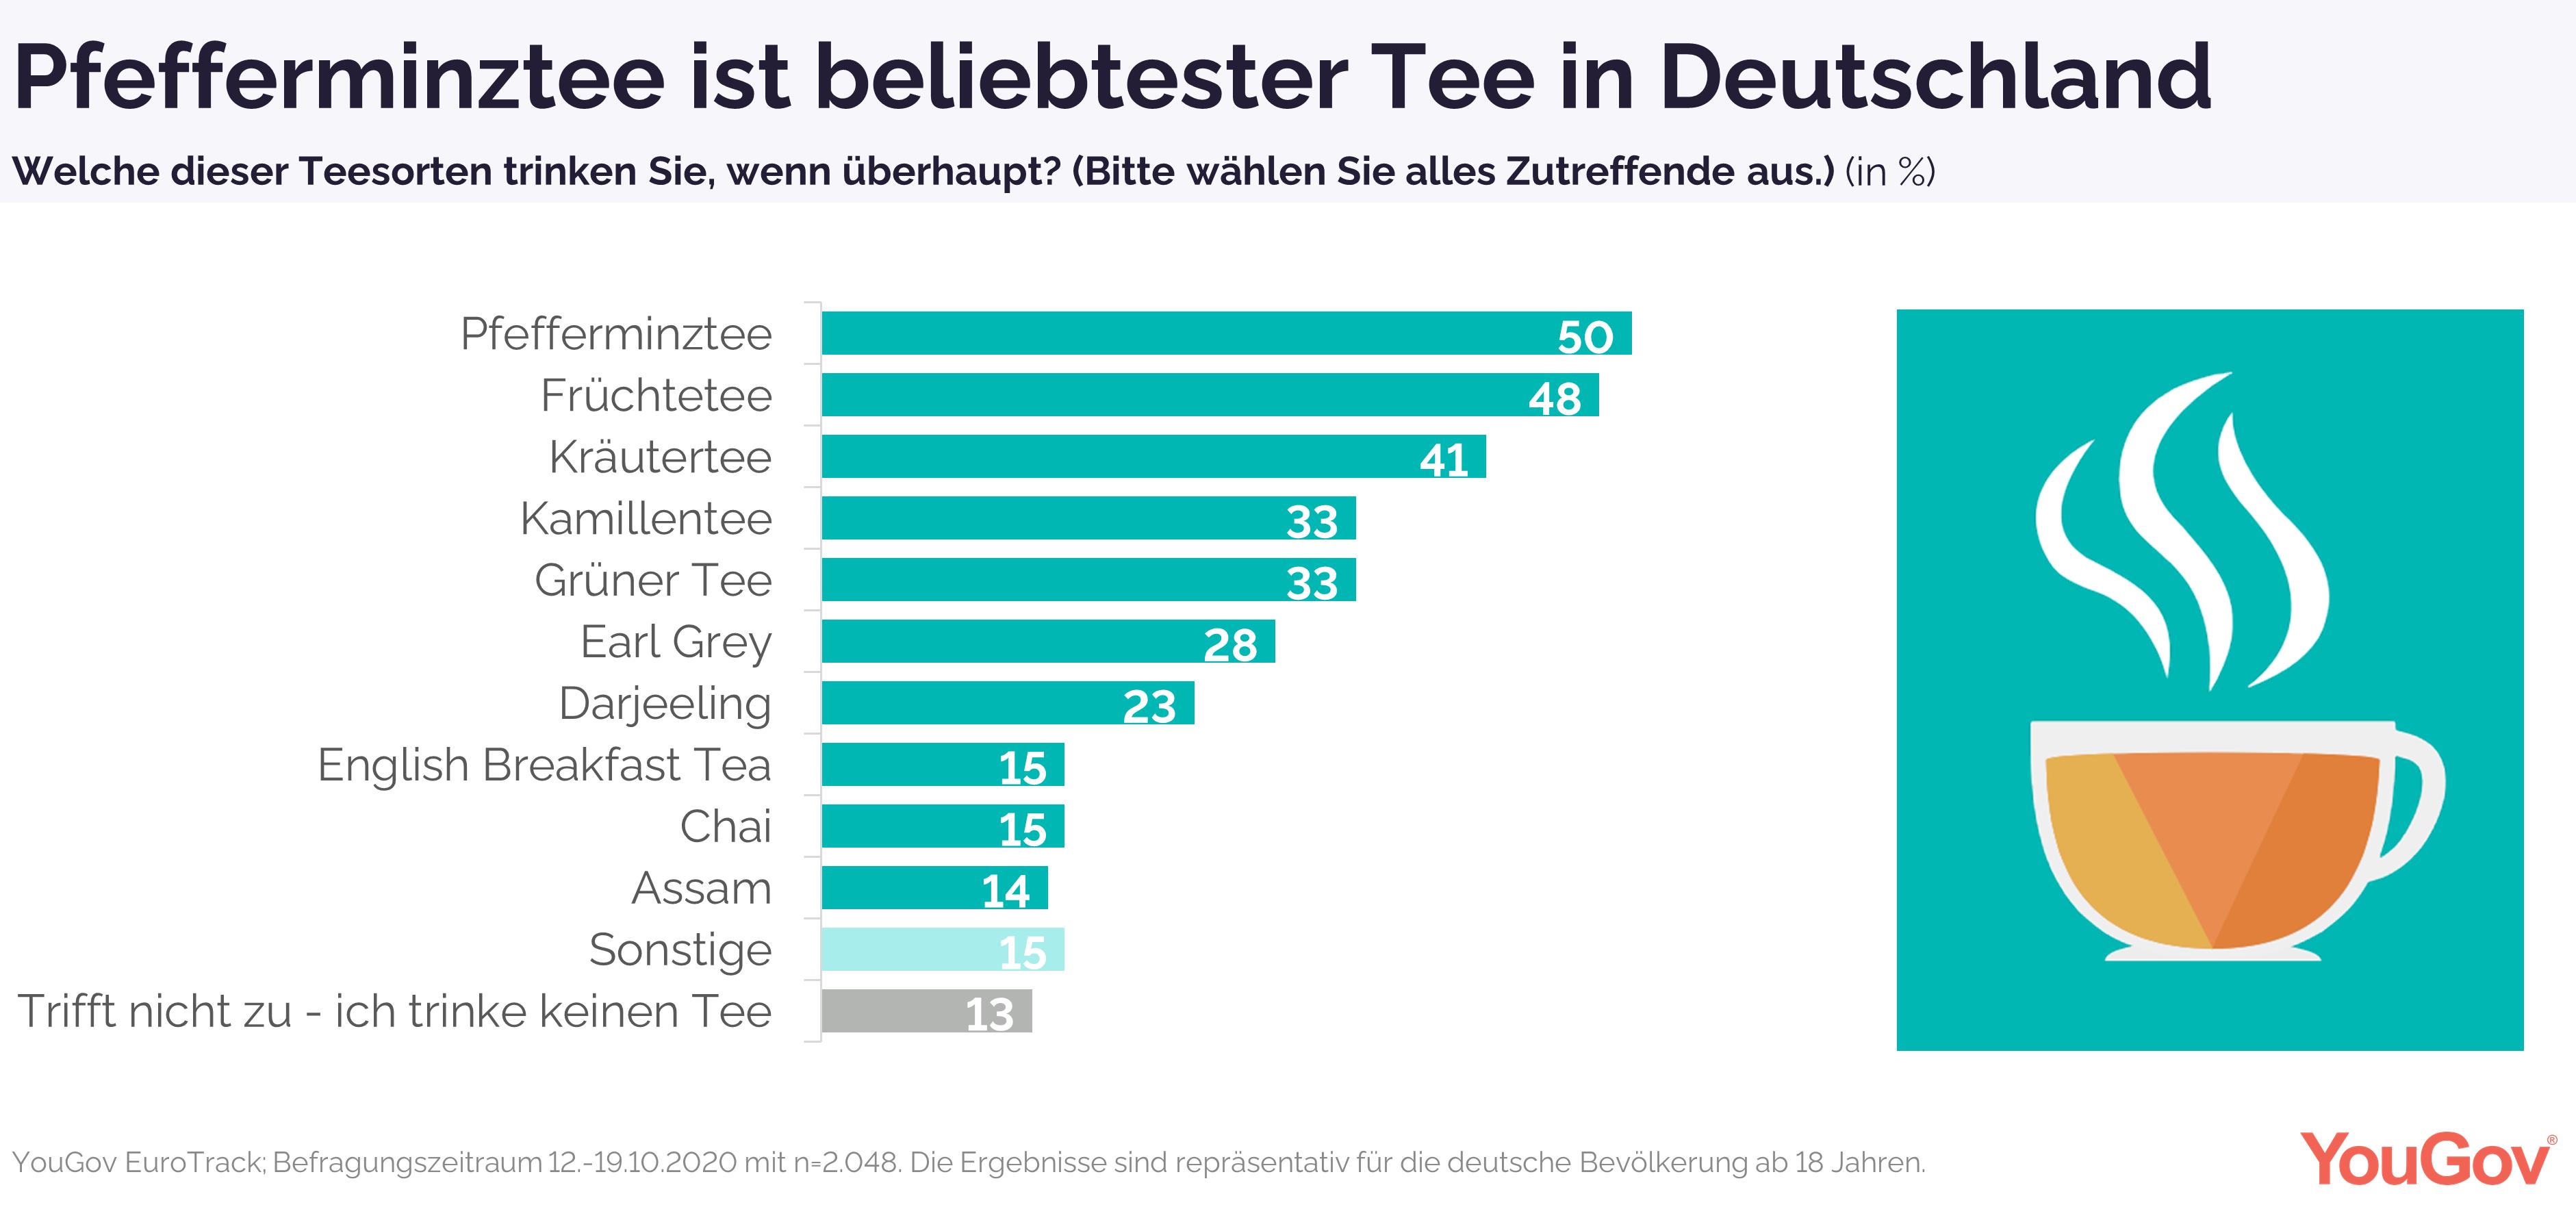 Pfefferminztee beliebtester Tee in Deutschland